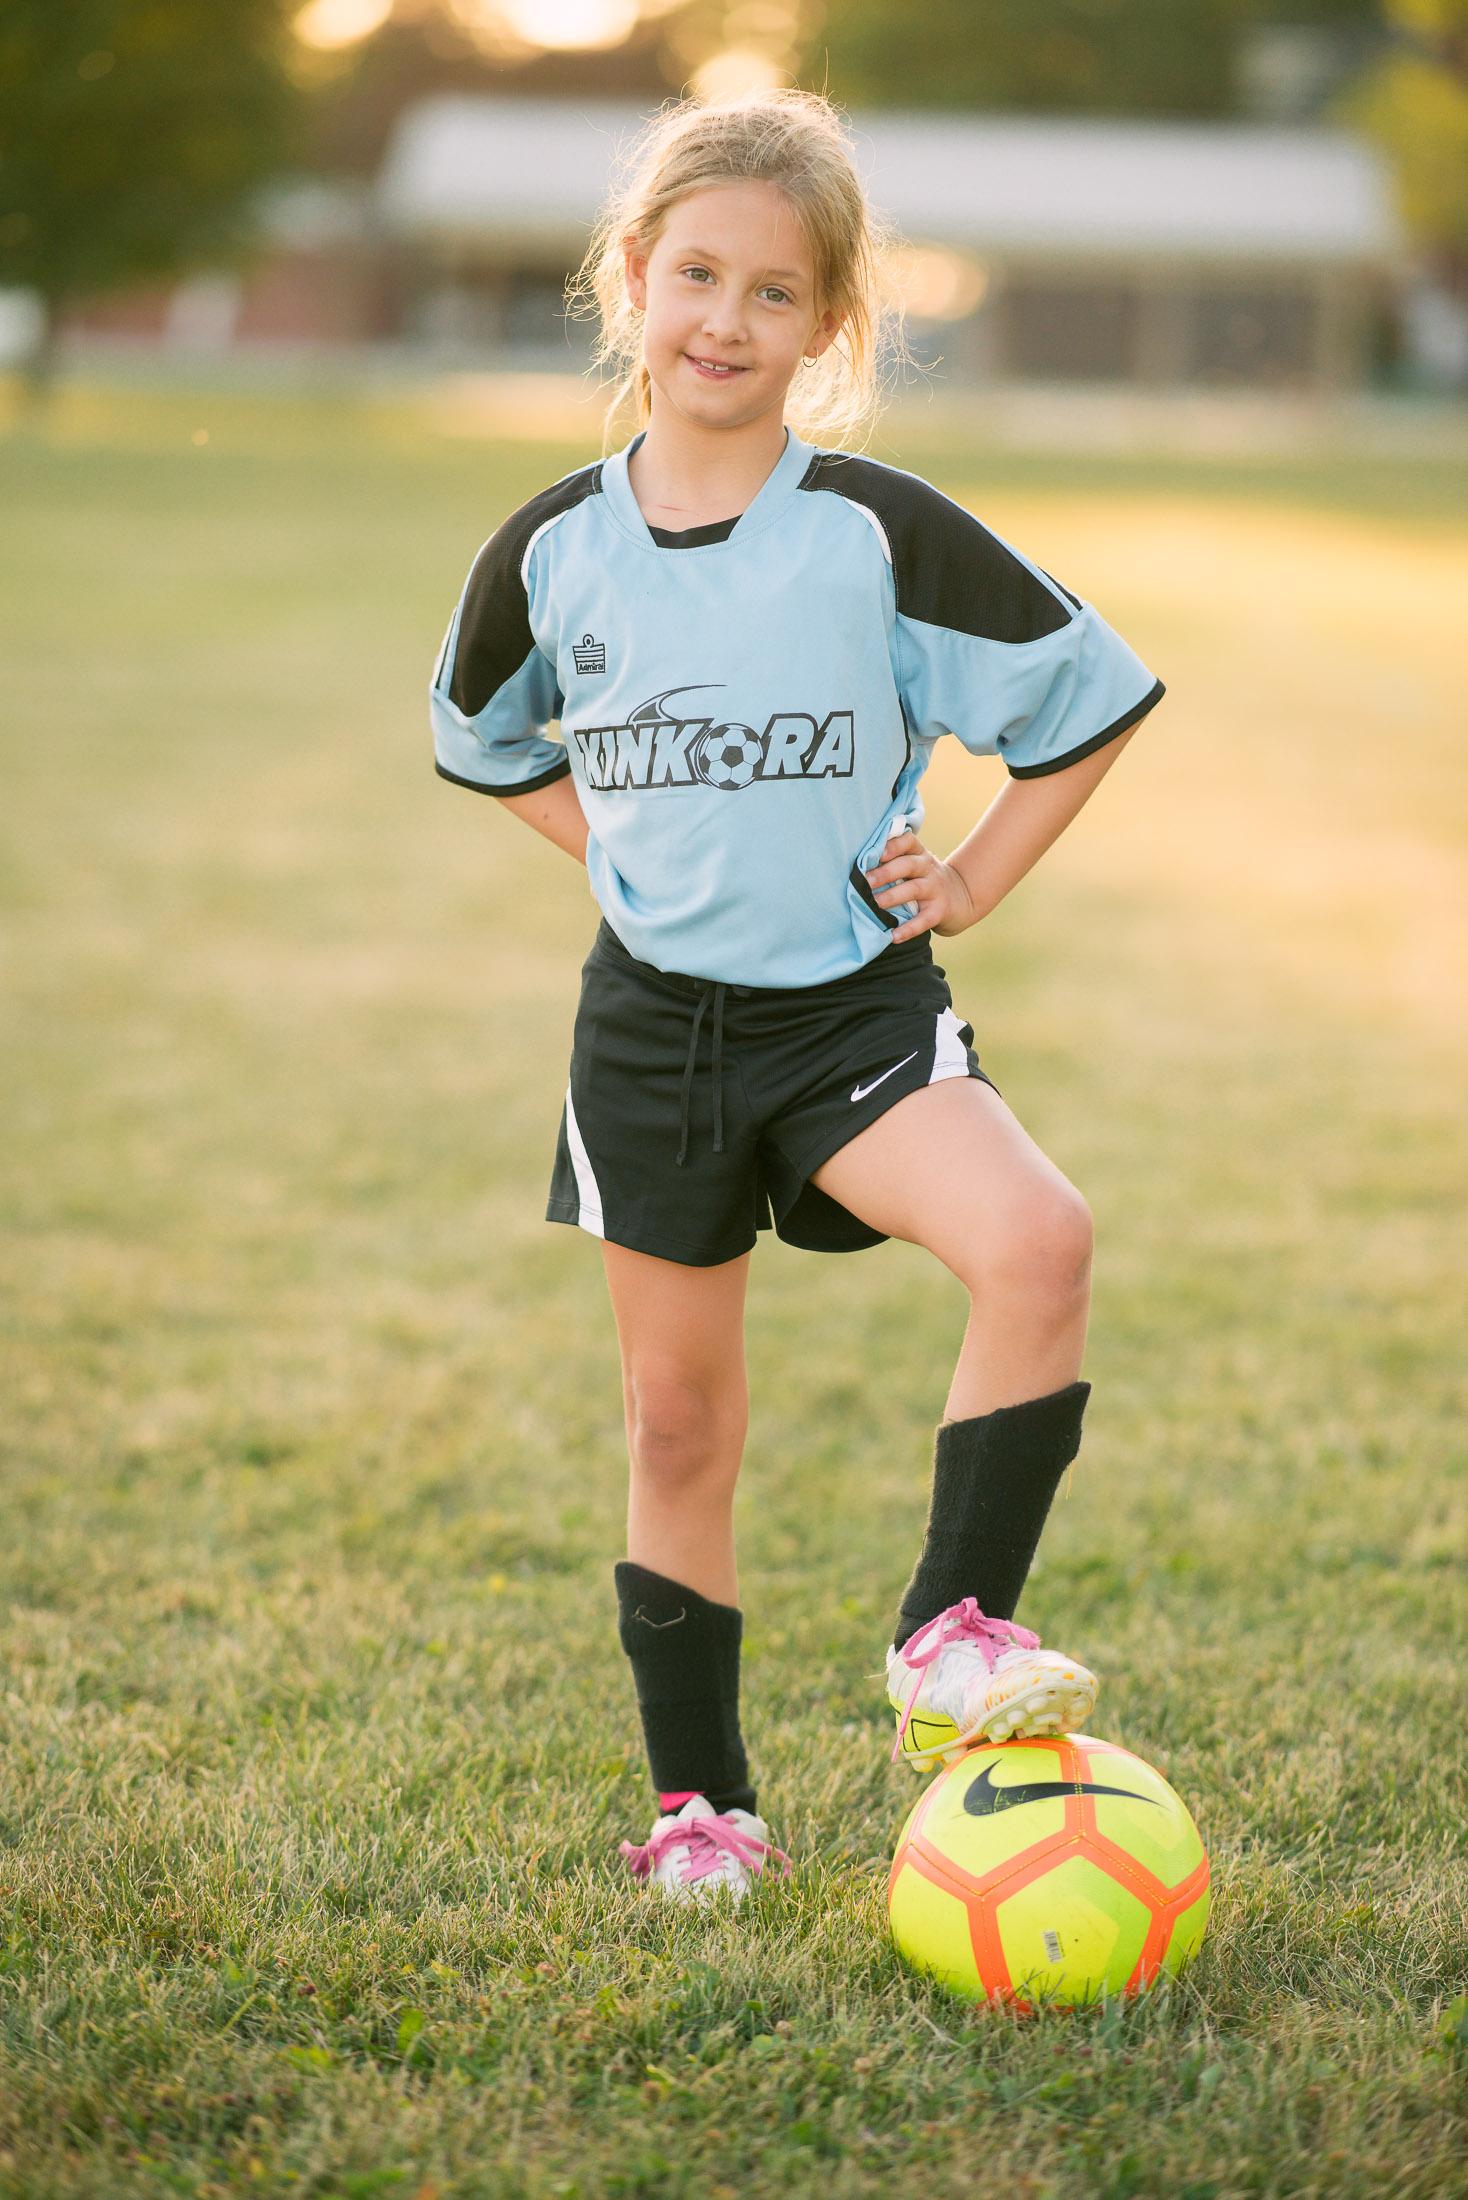 Kinkora-Soccer-Photos-049.jpg